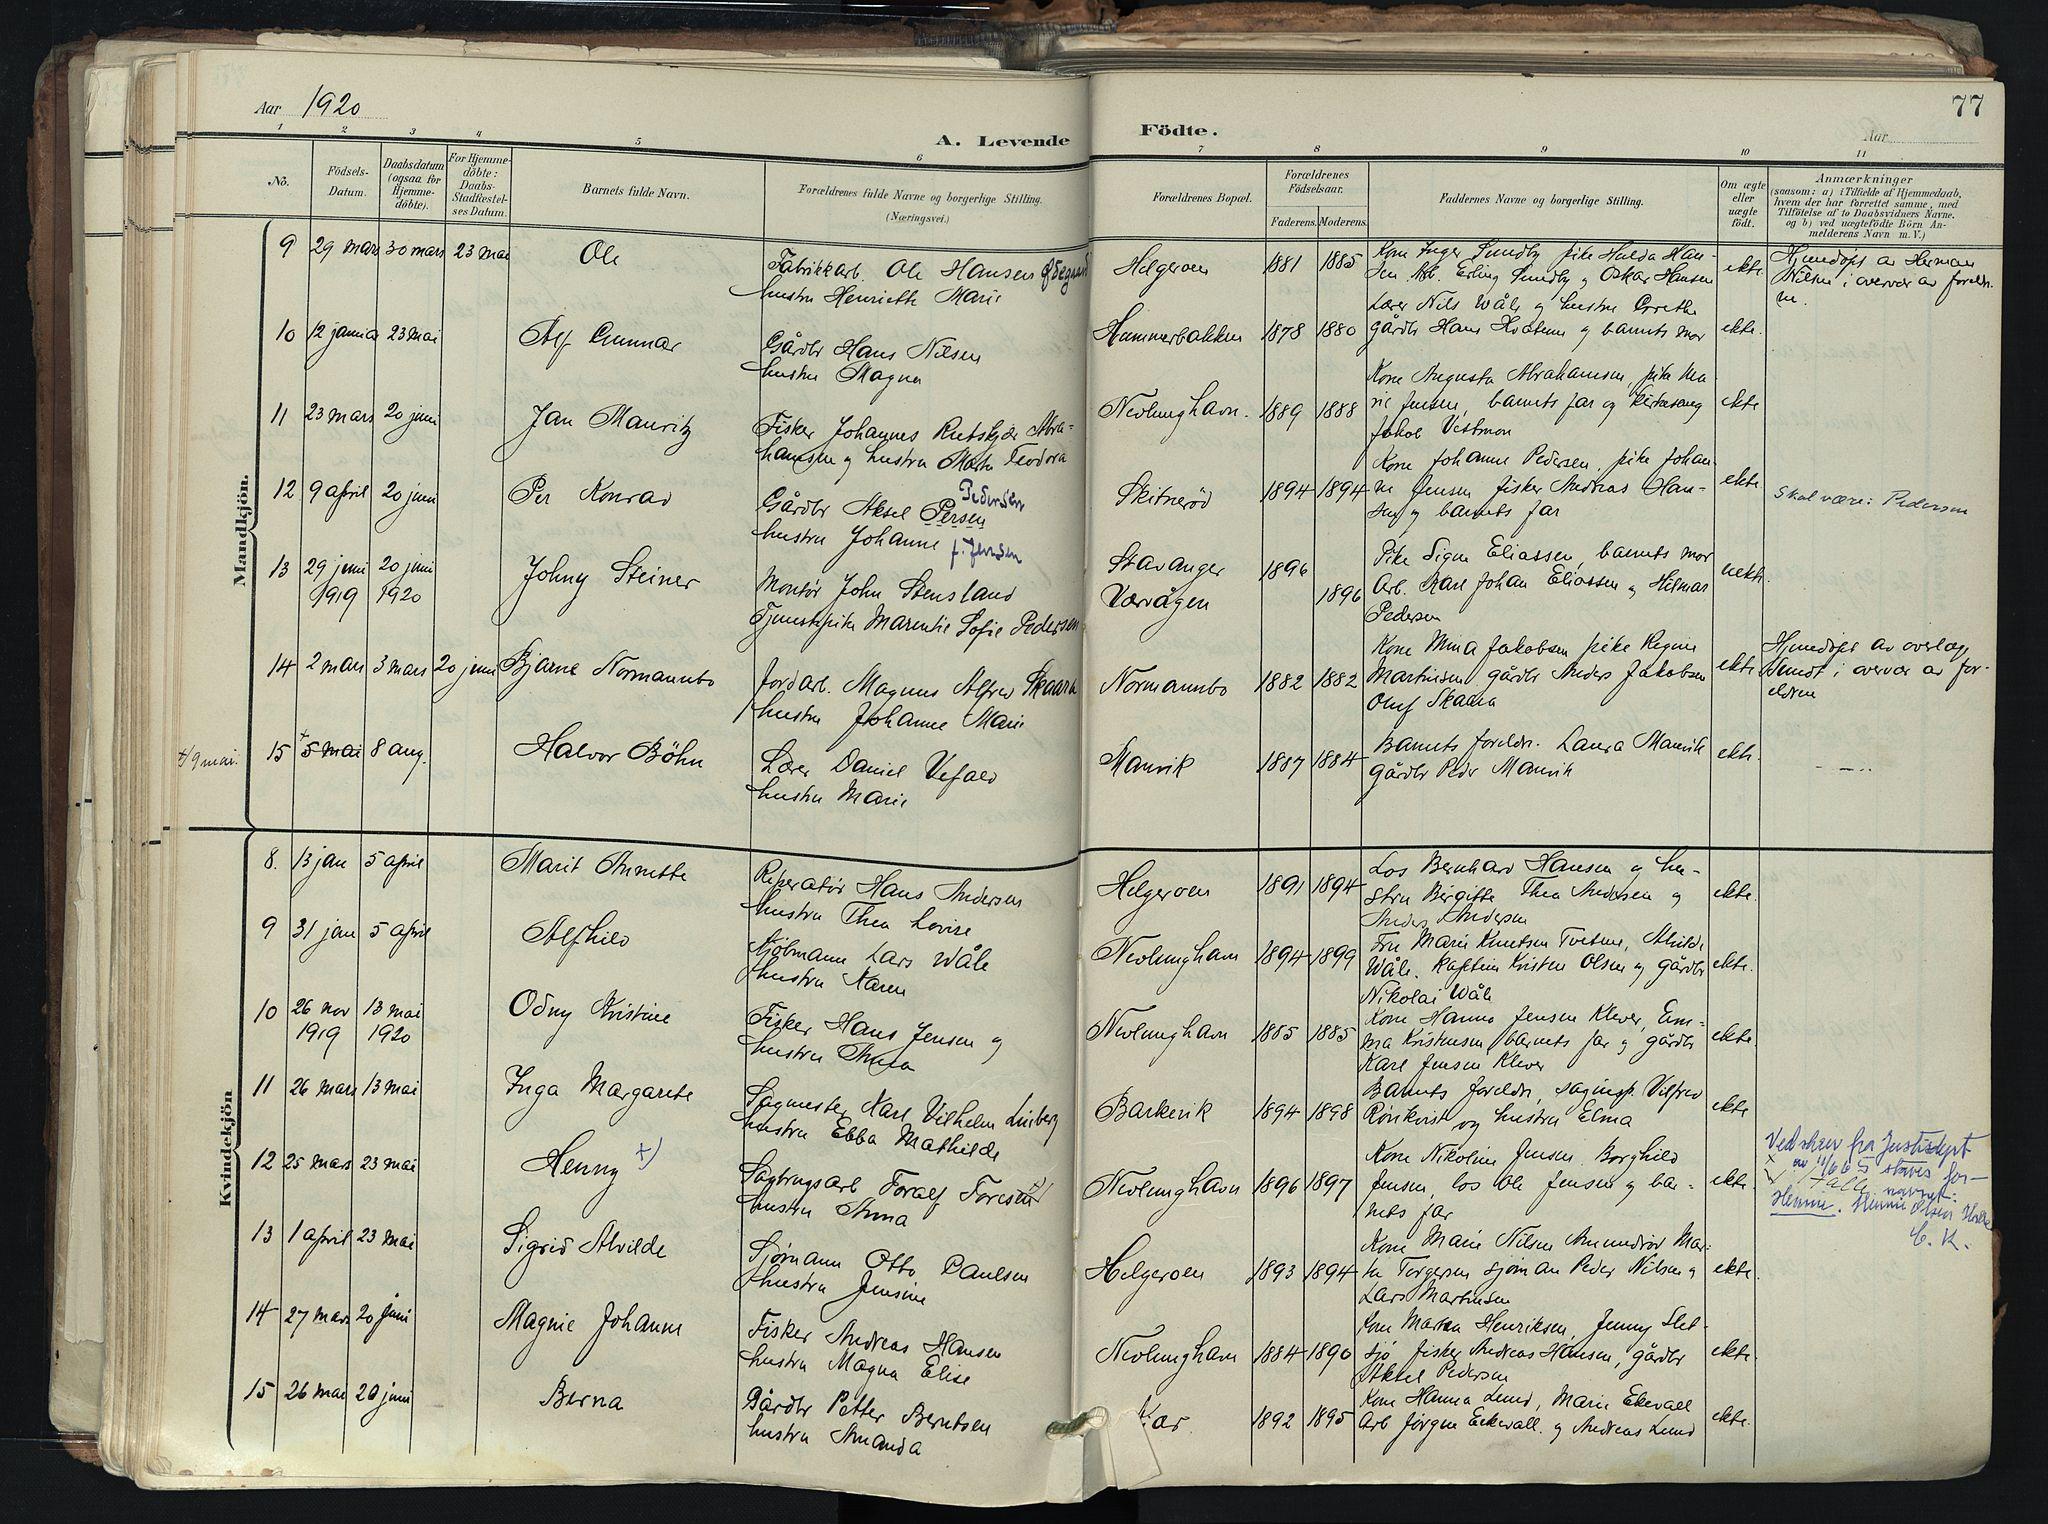 SAKO, Brunlanes kirkebøker, F/Fb/L0003: Ministerialbok nr. II 3, 1900-1922, s. 77